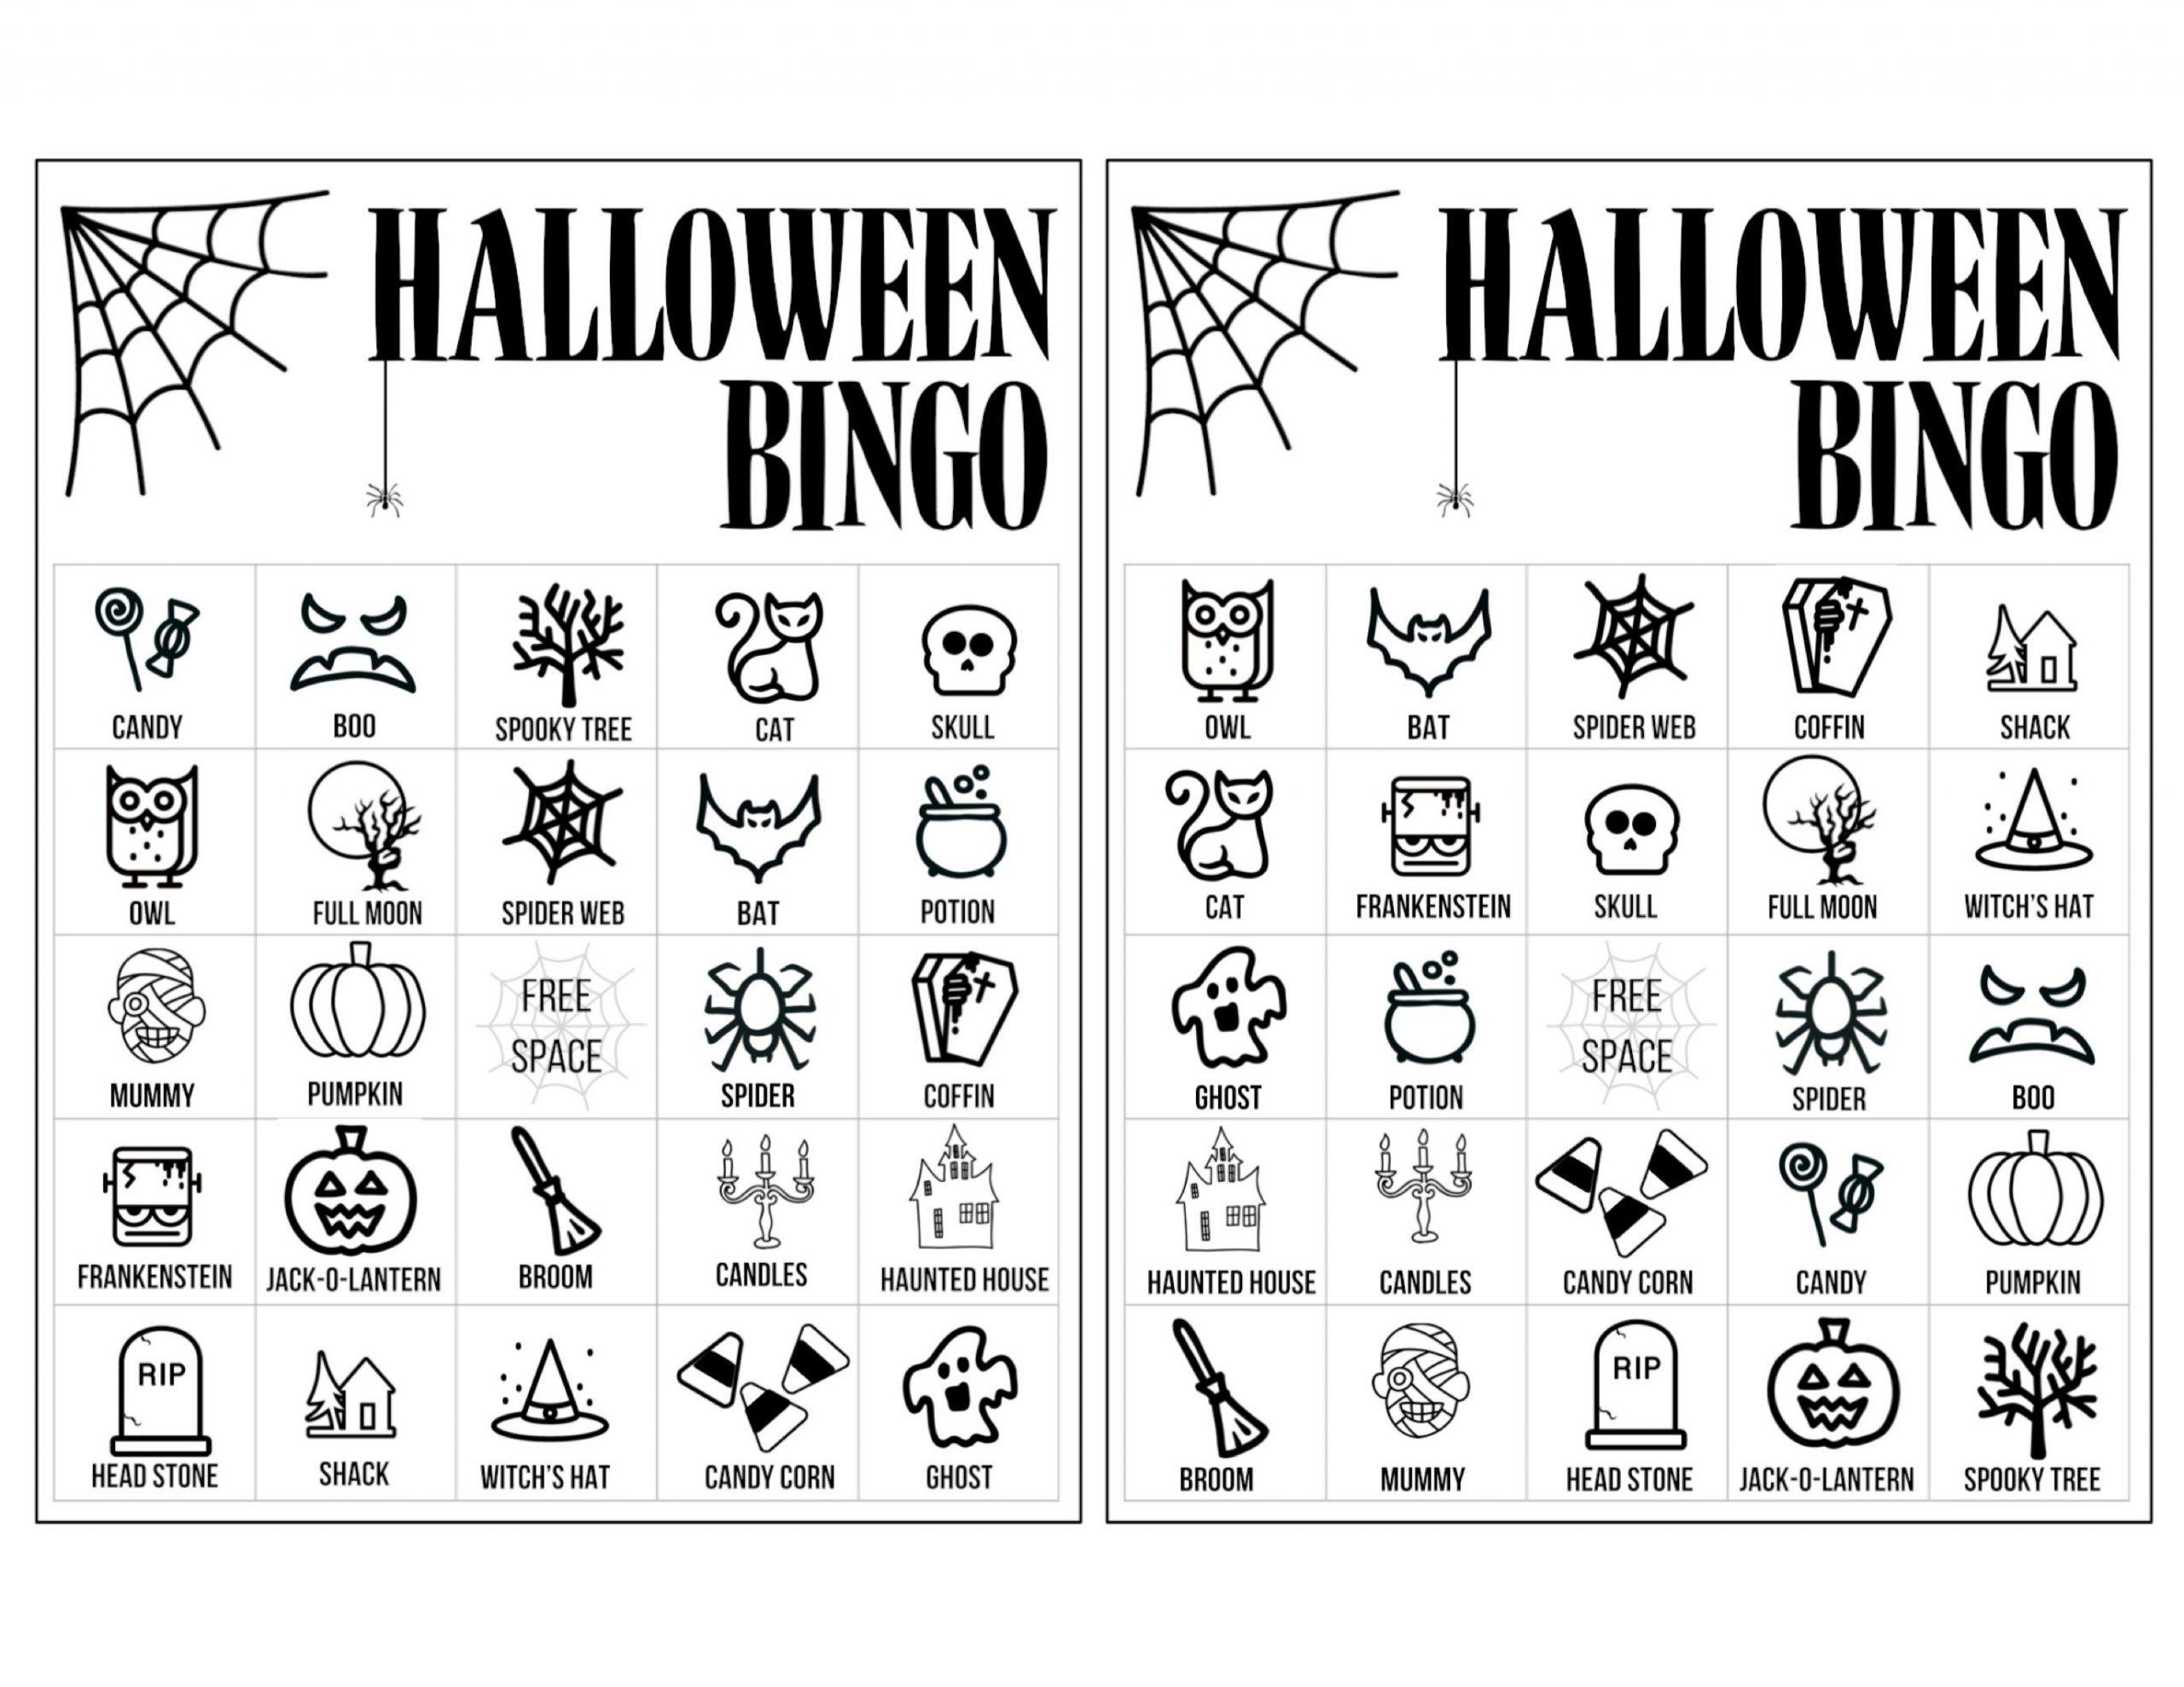 Halloween-Bingo-Cards-1-2 (2750×2125) | Halloween Bingo